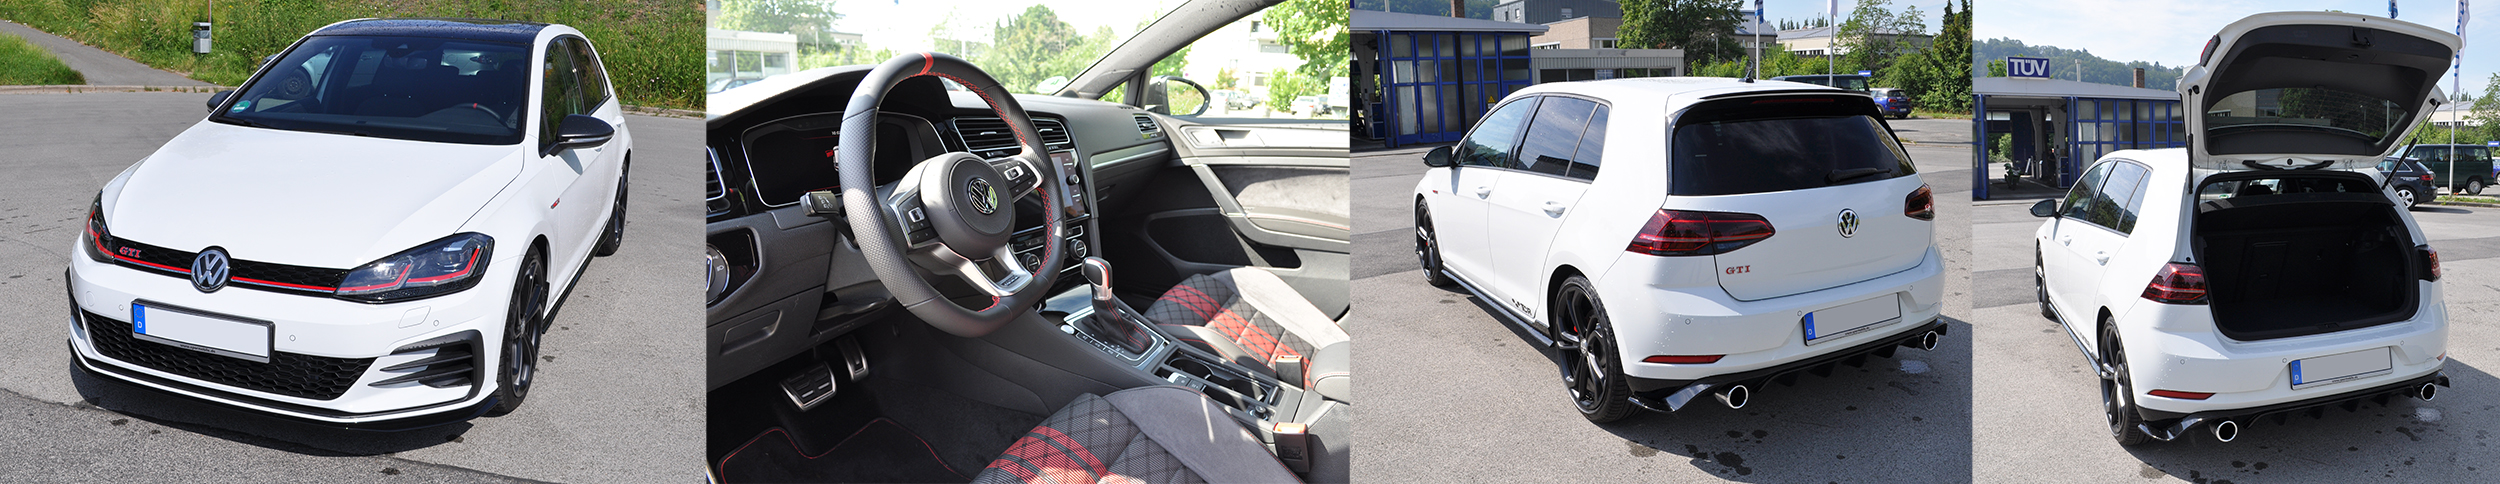 VW Golf GTI TCR Ausstattung